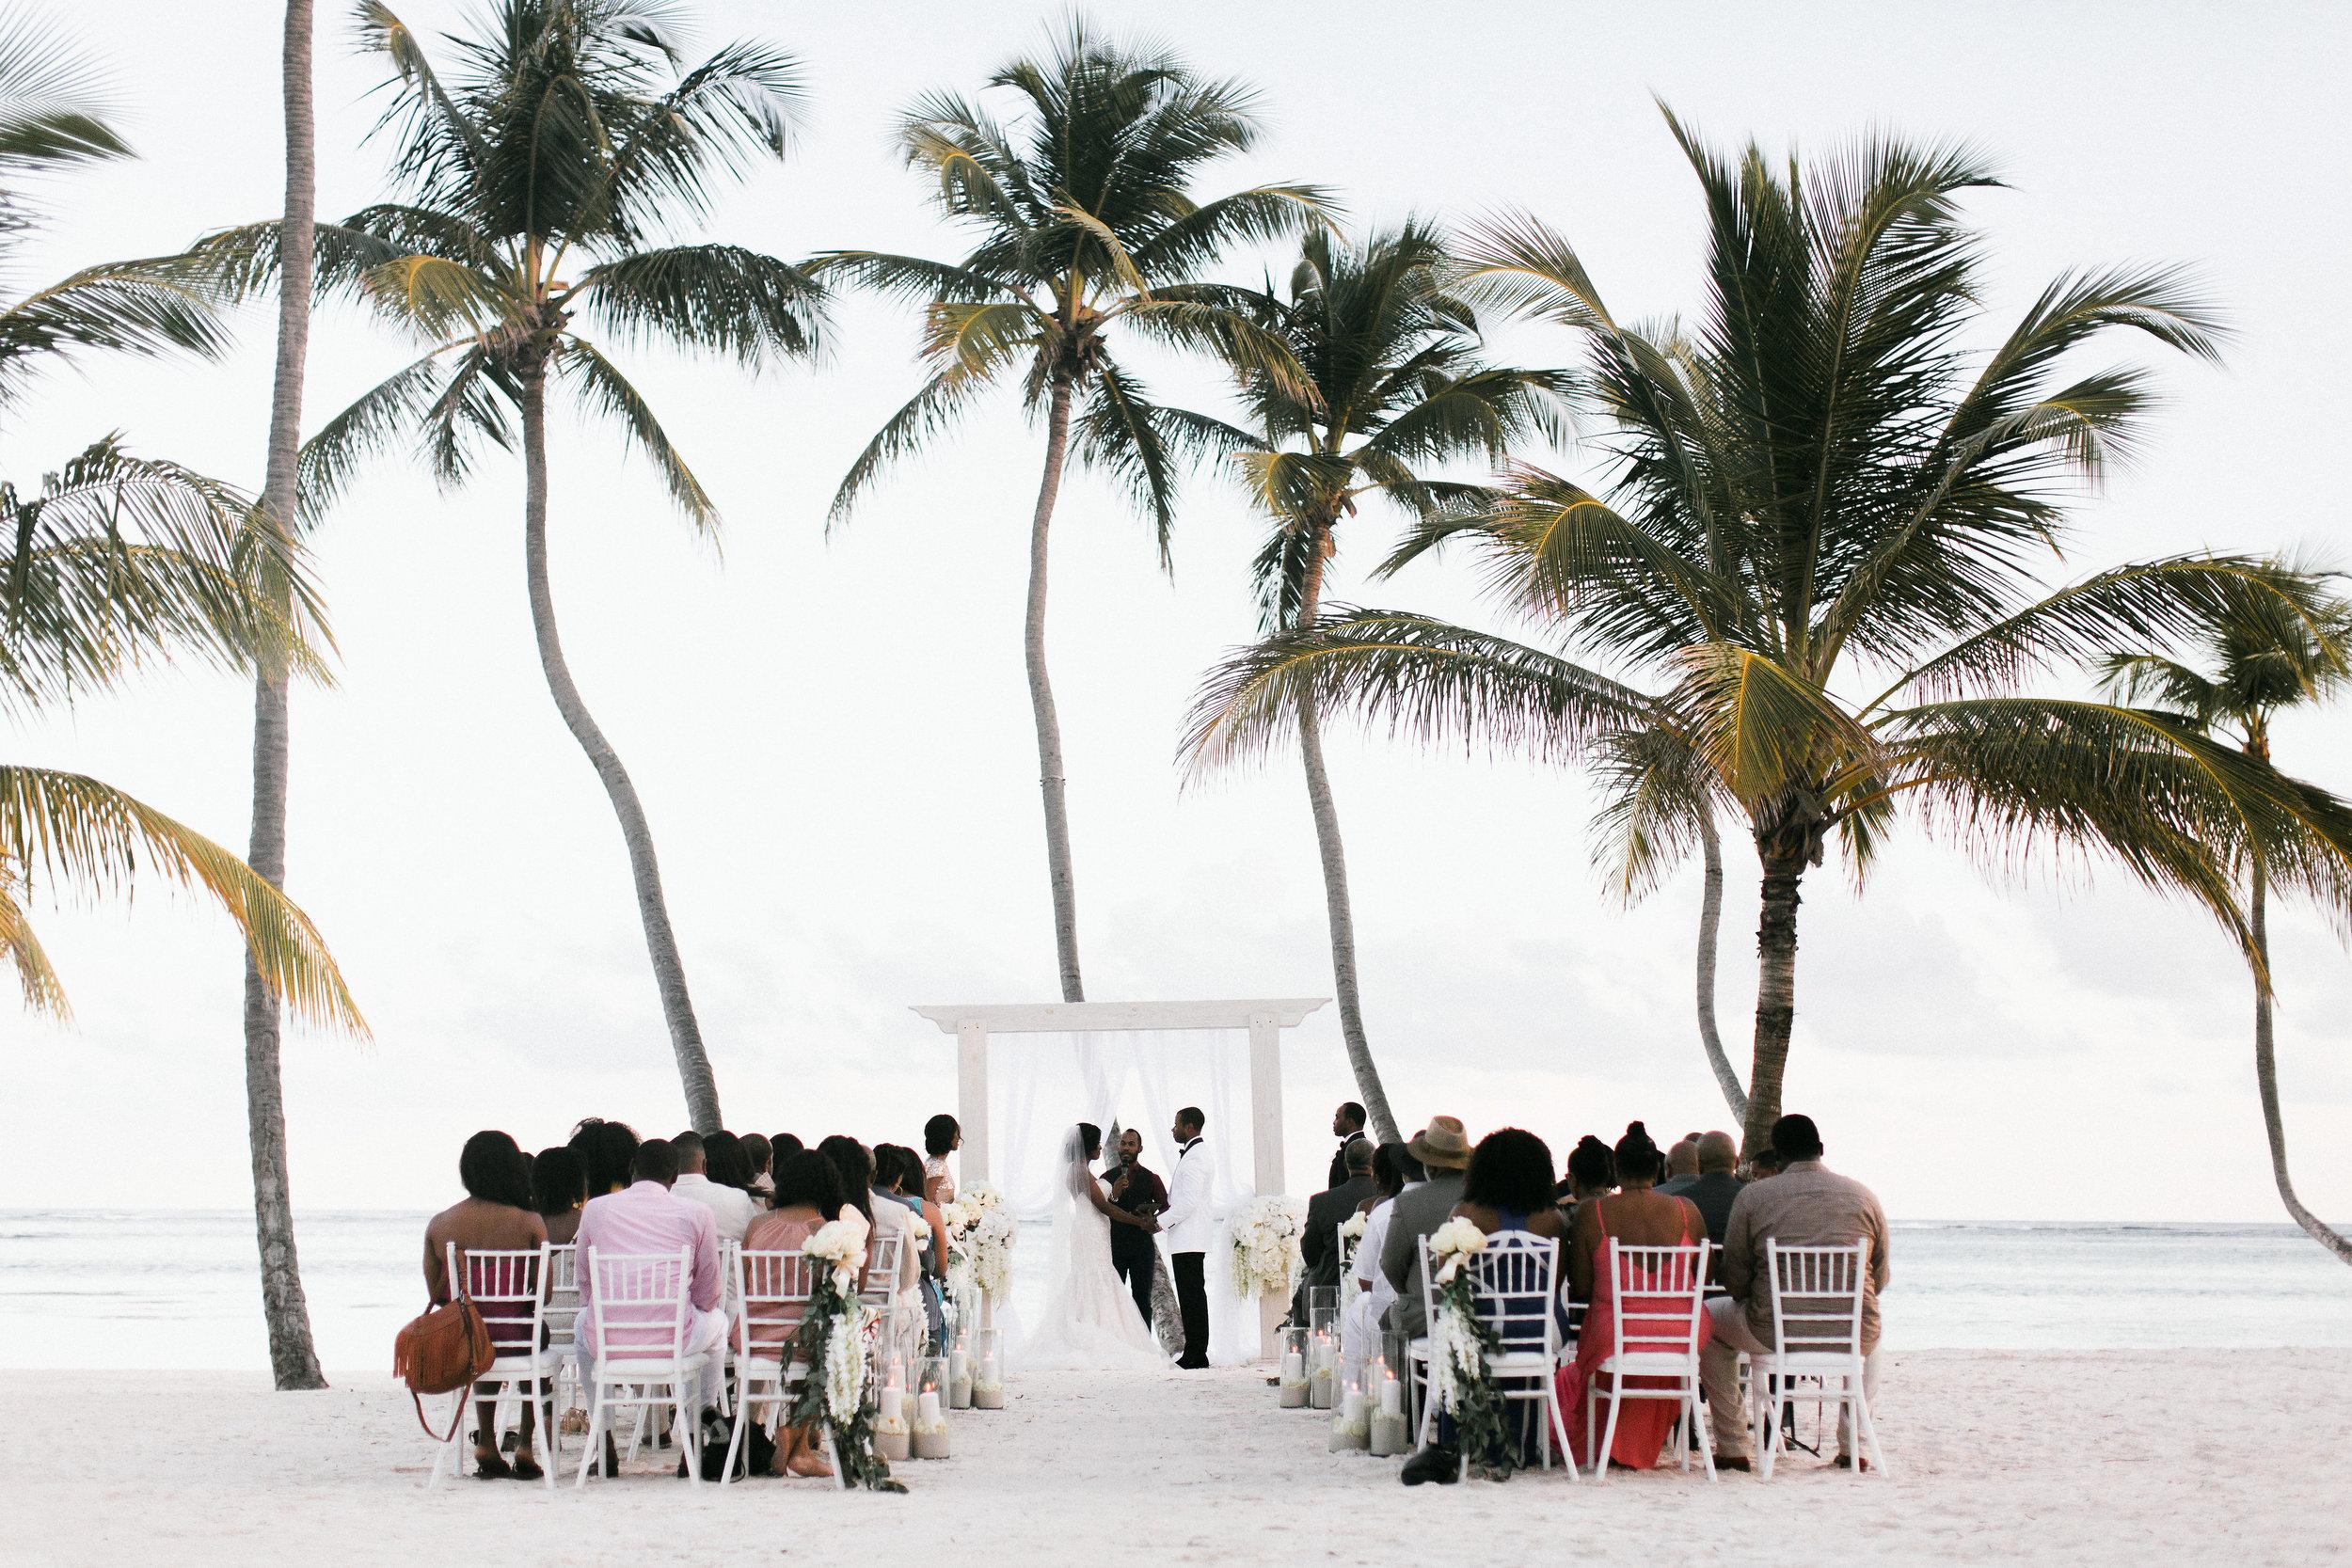 CM Events, Destination Weddings | Playa Blanca, Punta Cana Resort and Club